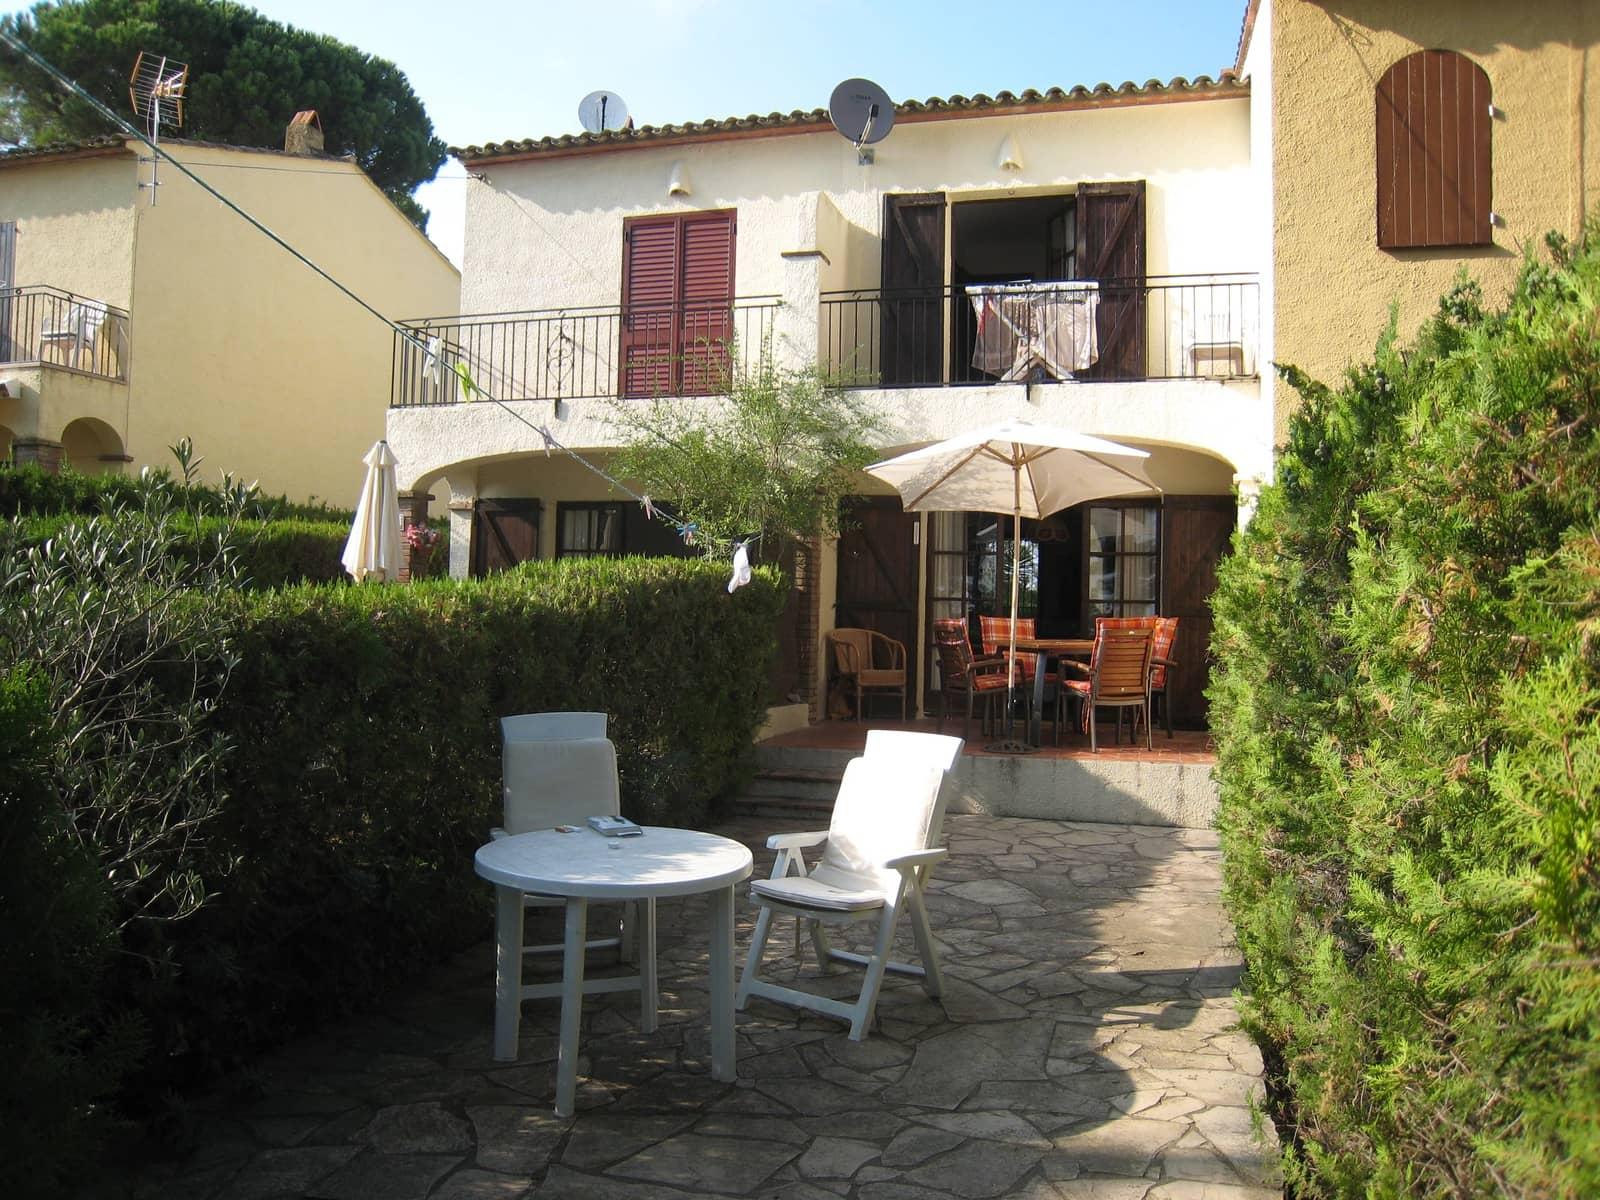 2 bedroom Terraced Villa for holiday rental in L'Estartit with pool - € 343 (Ref: 4631424)